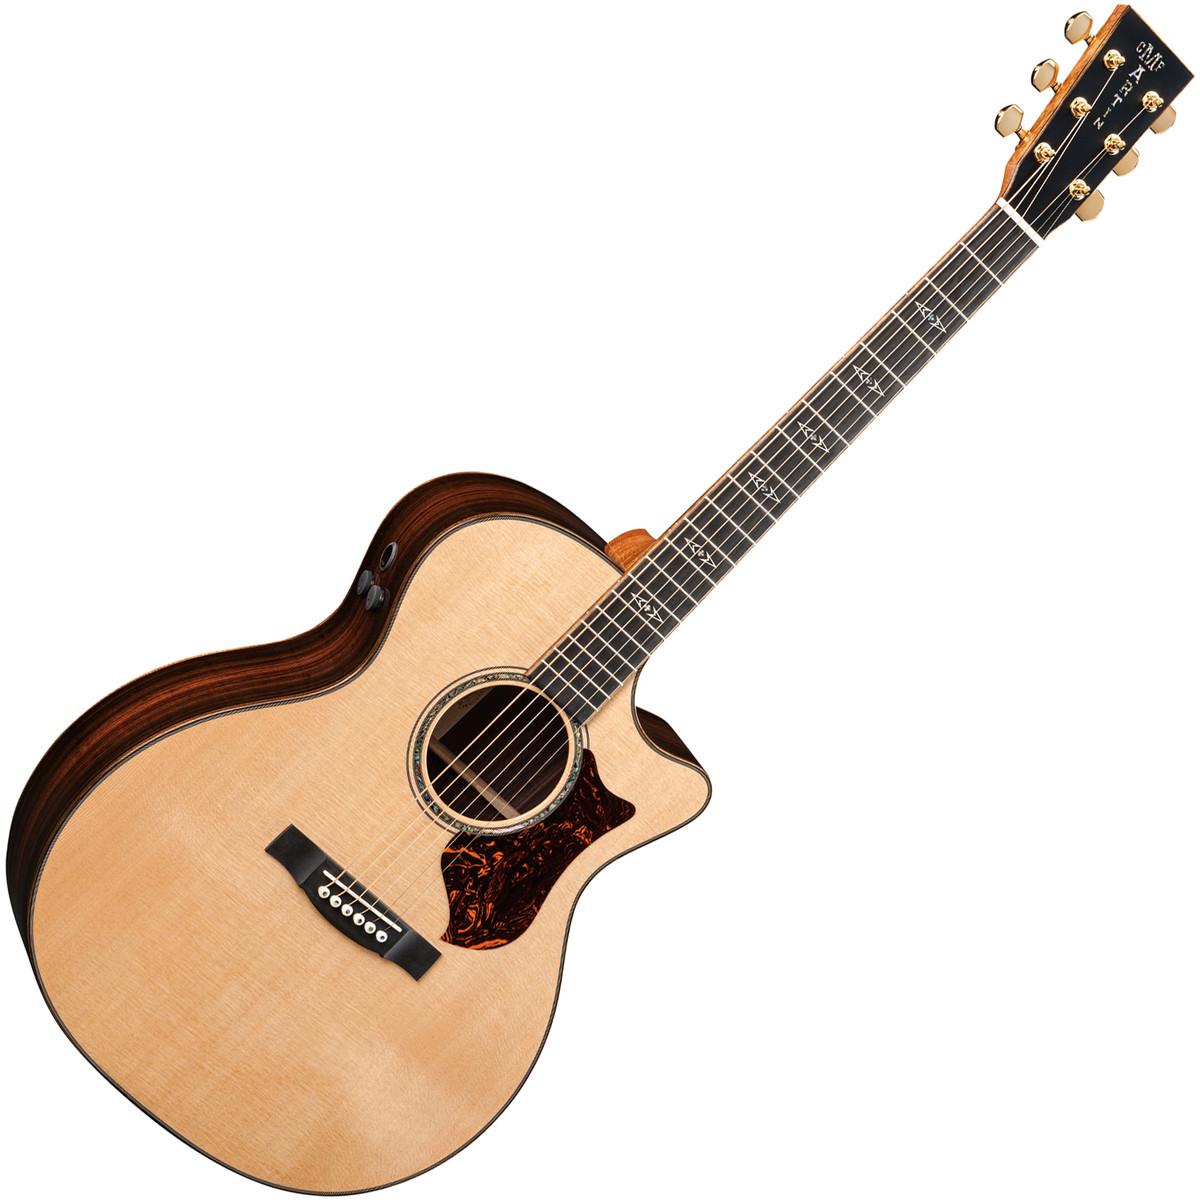 en mode hors connexion martin gpcpa1 plus artiste guitare. Black Bedroom Furniture Sets. Home Design Ideas